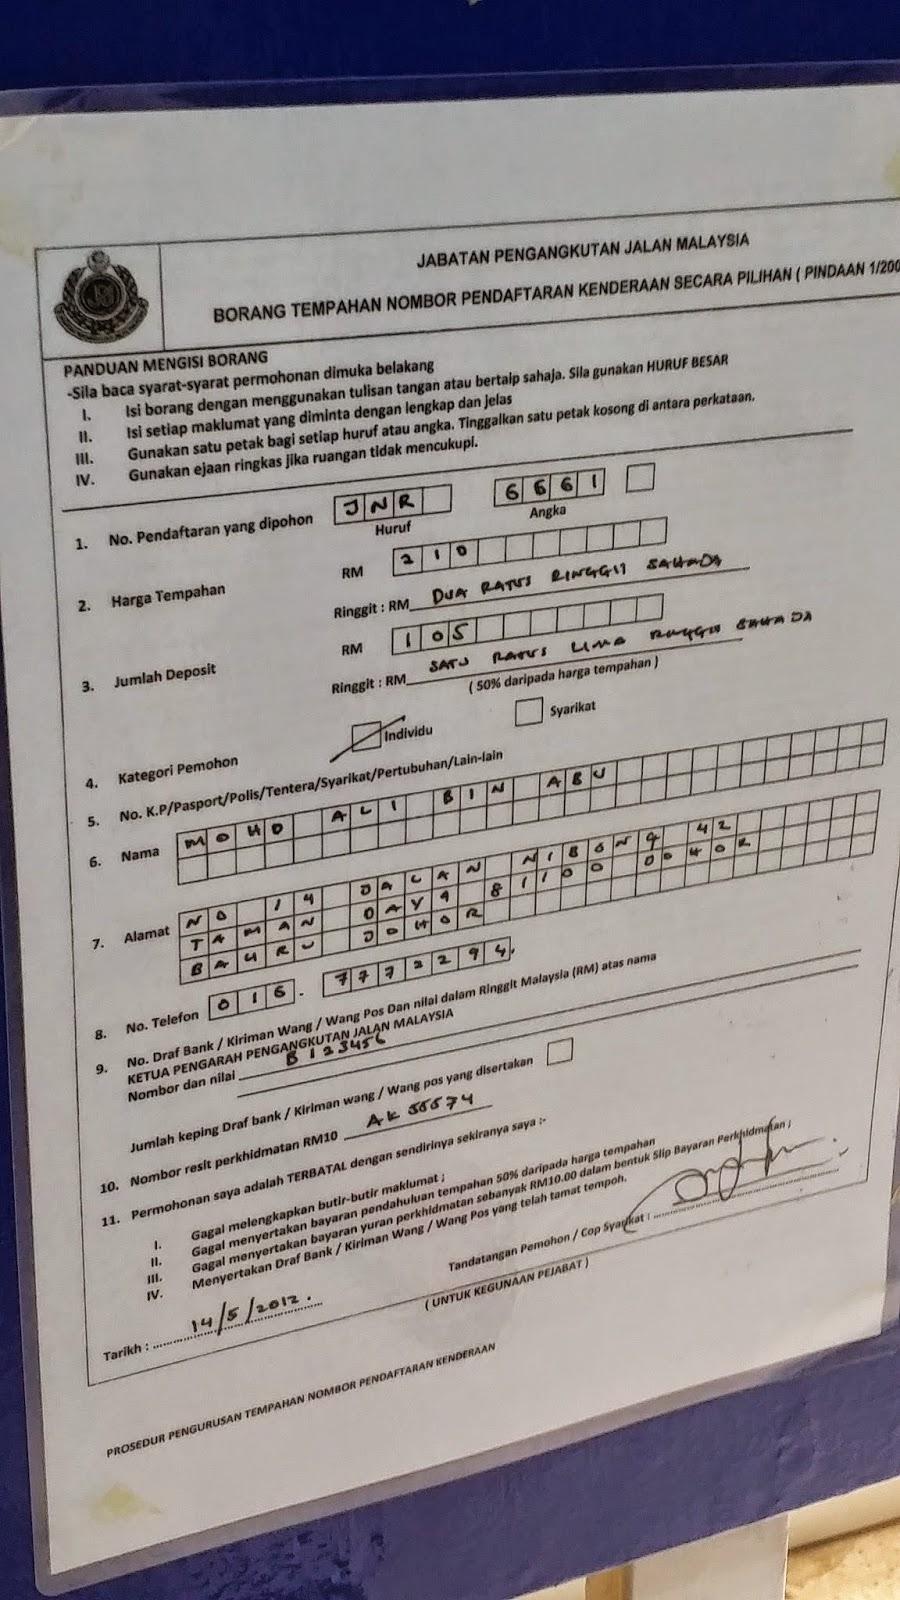 Jpj No Plate Tender Result Johor Tender Form M V10